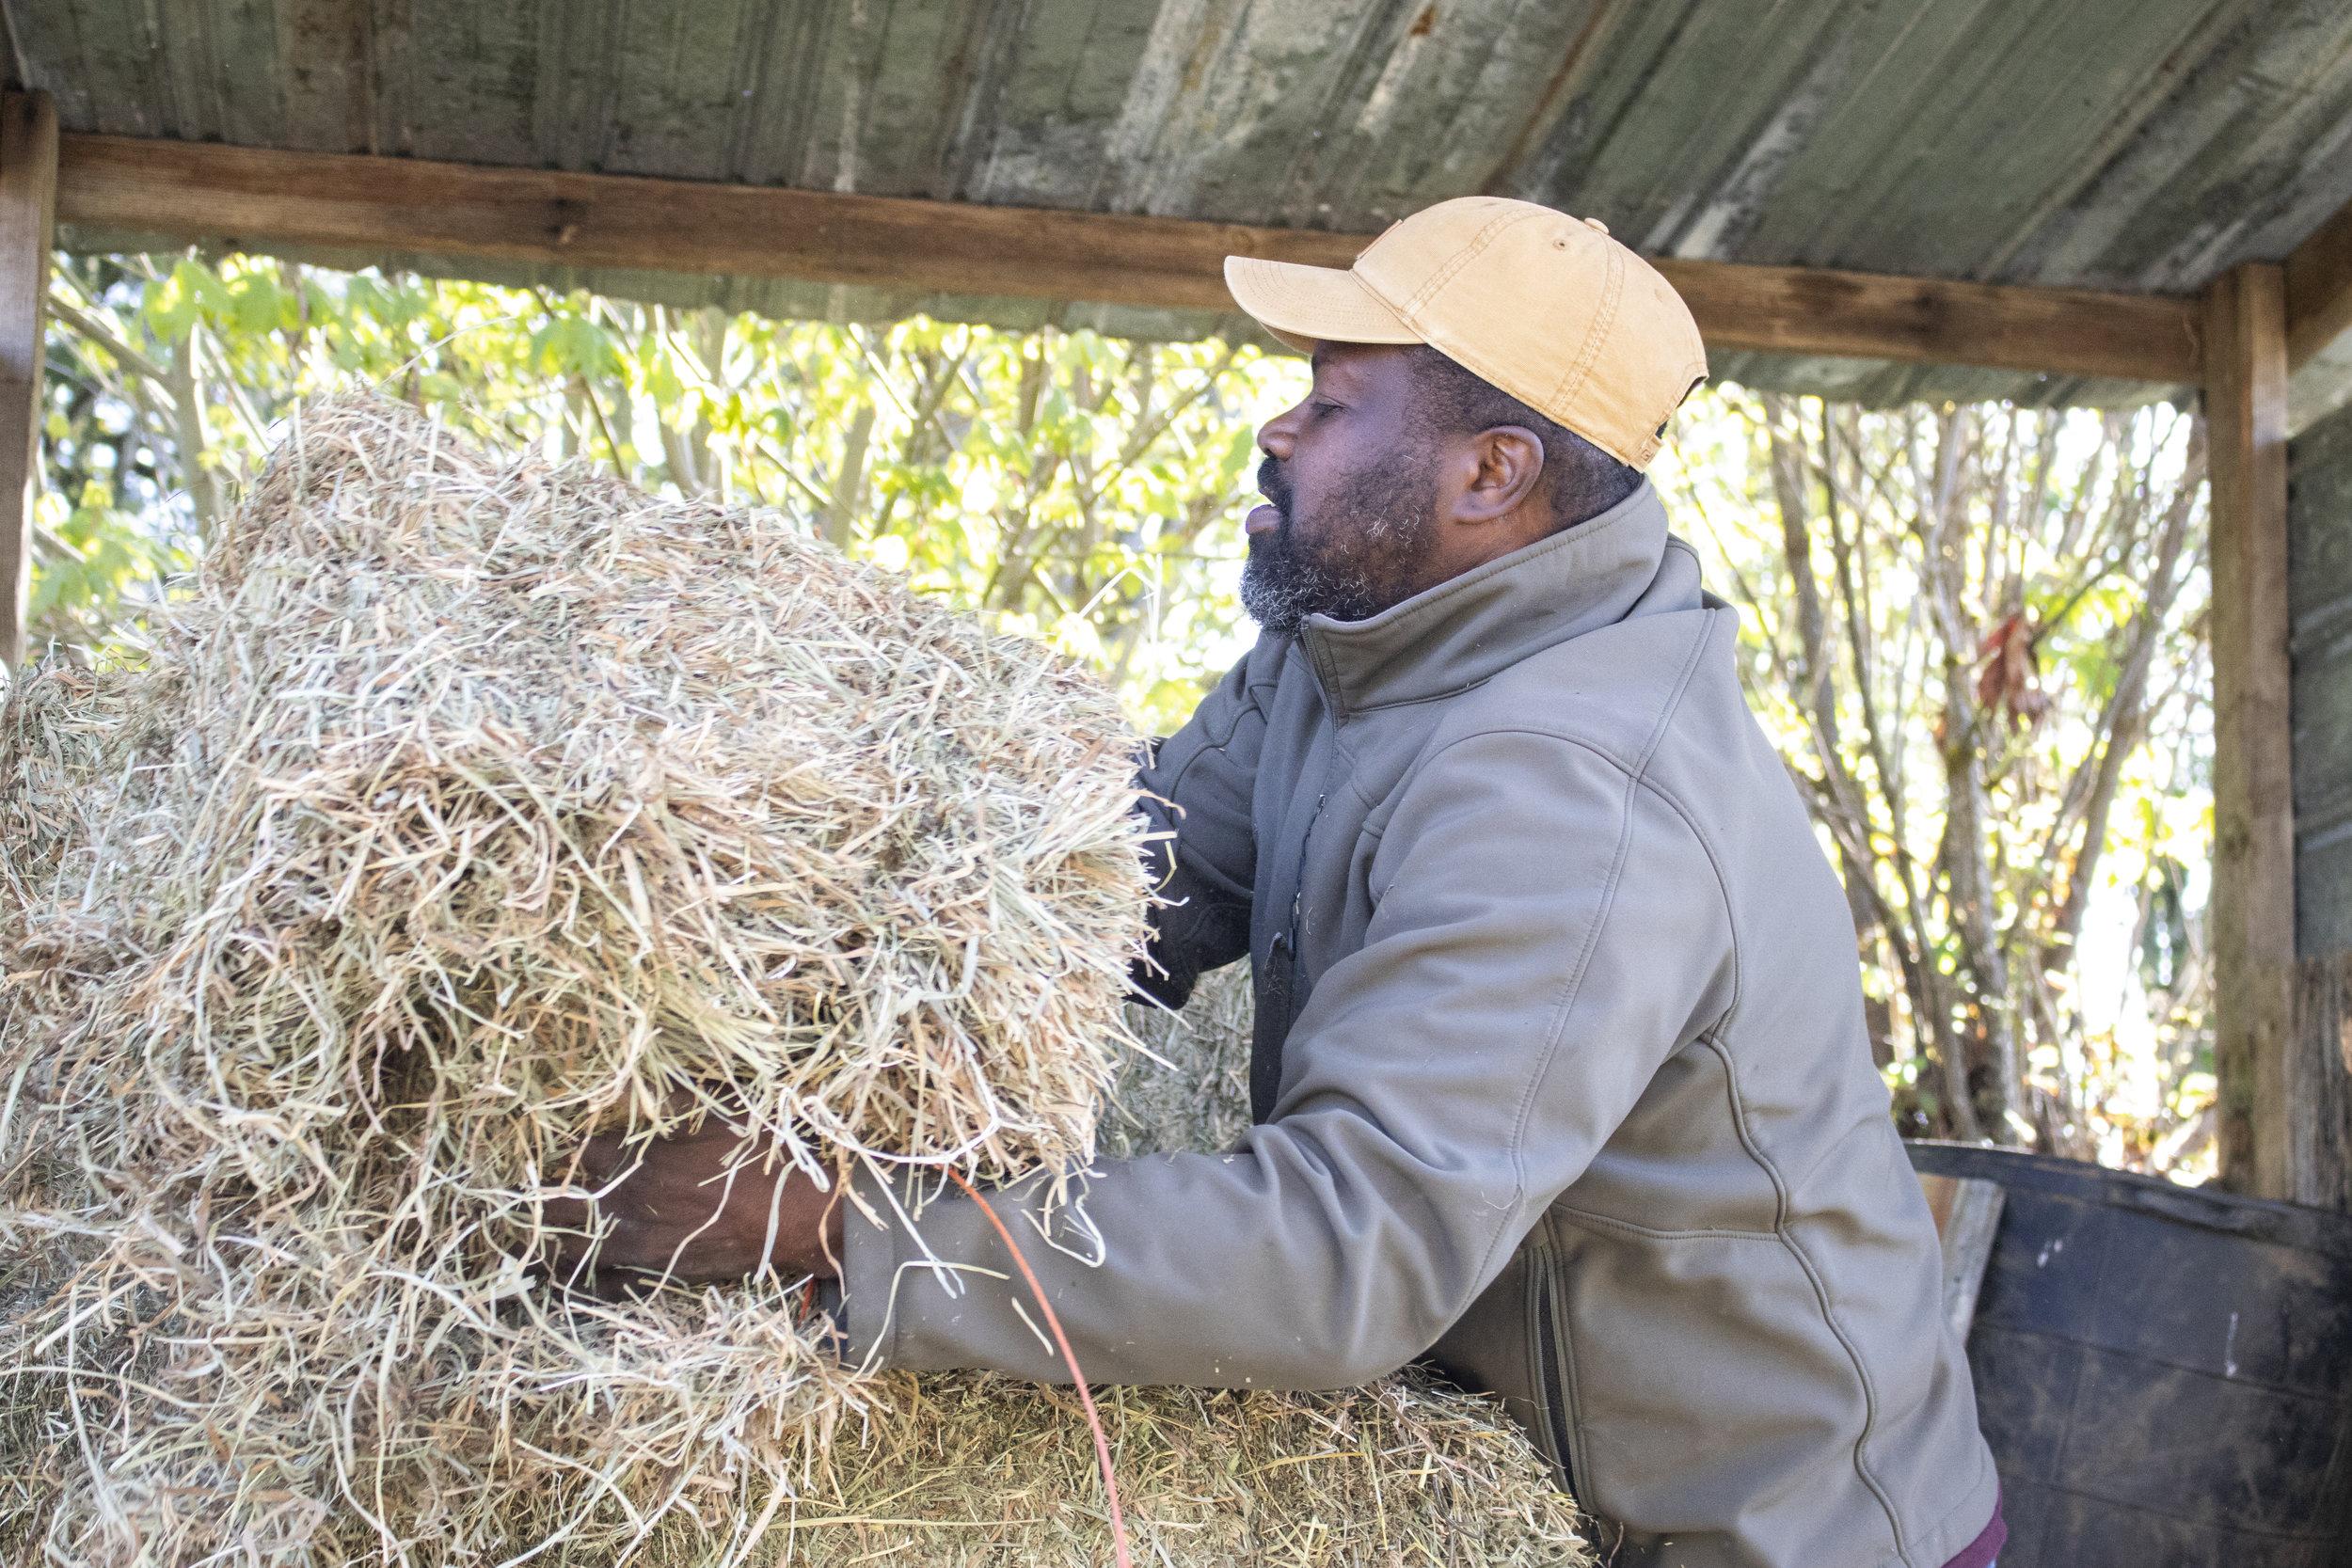 Rohn preparing to feed his horses.